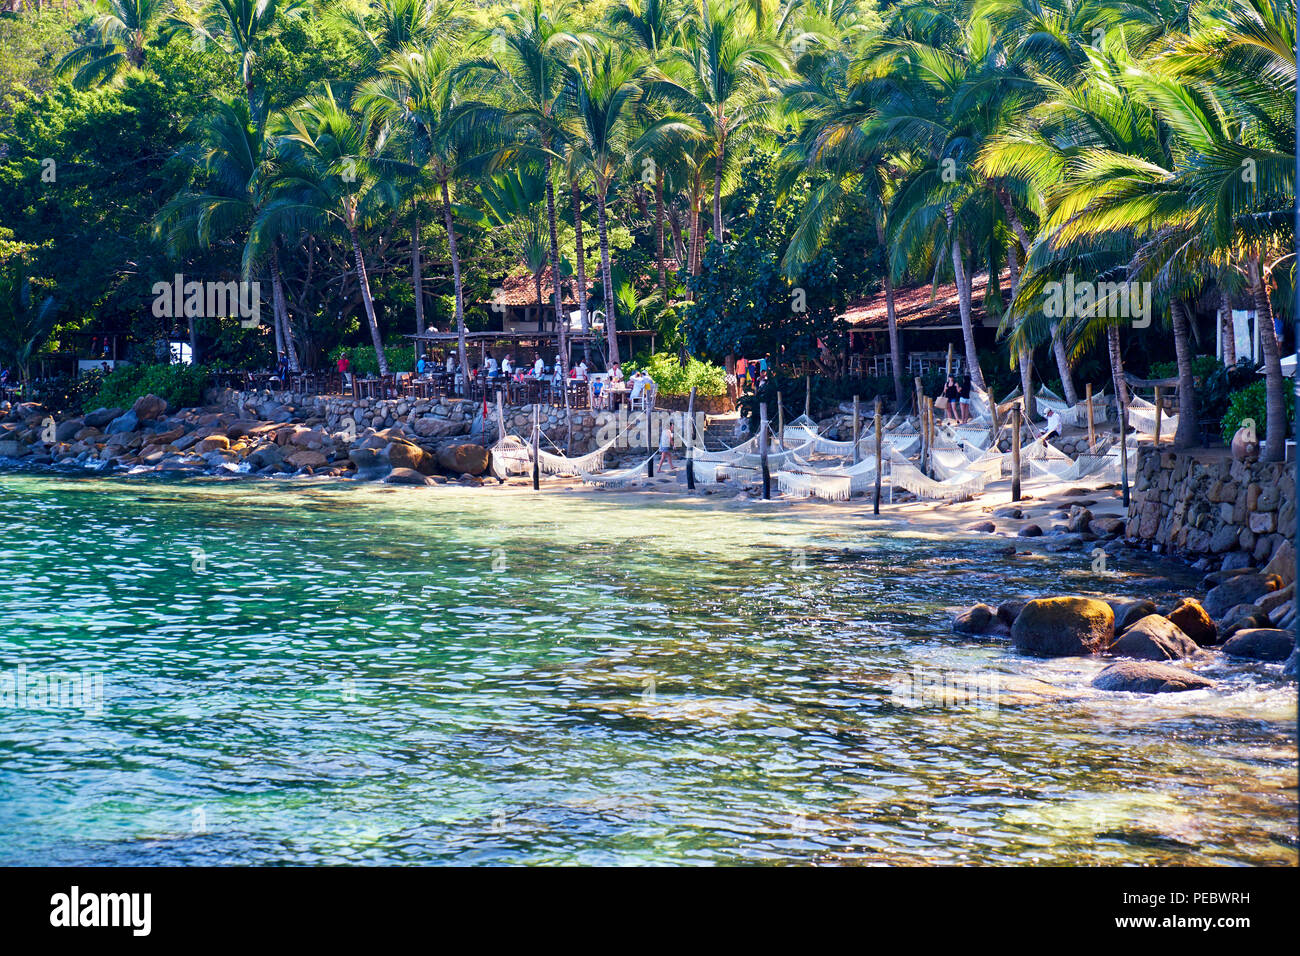 Hammocks and Bars at a Beach Retreat, Las Caletas, Jalisco, Mexico - Stock Image